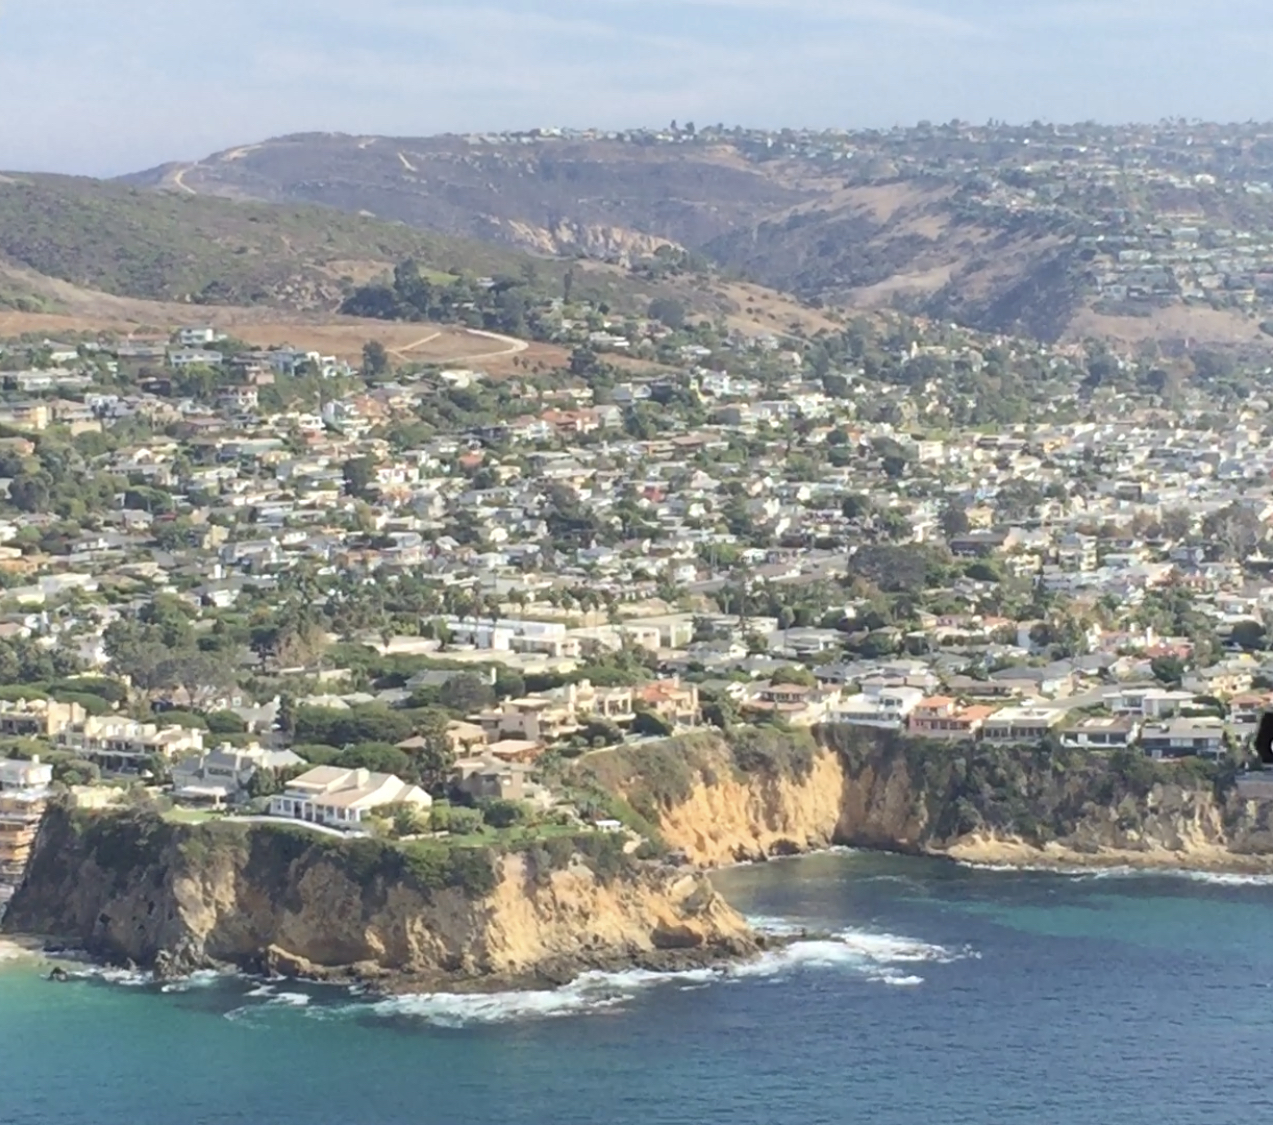 City Explores New Limits on Bluff Construction - Laguna Beach Local News